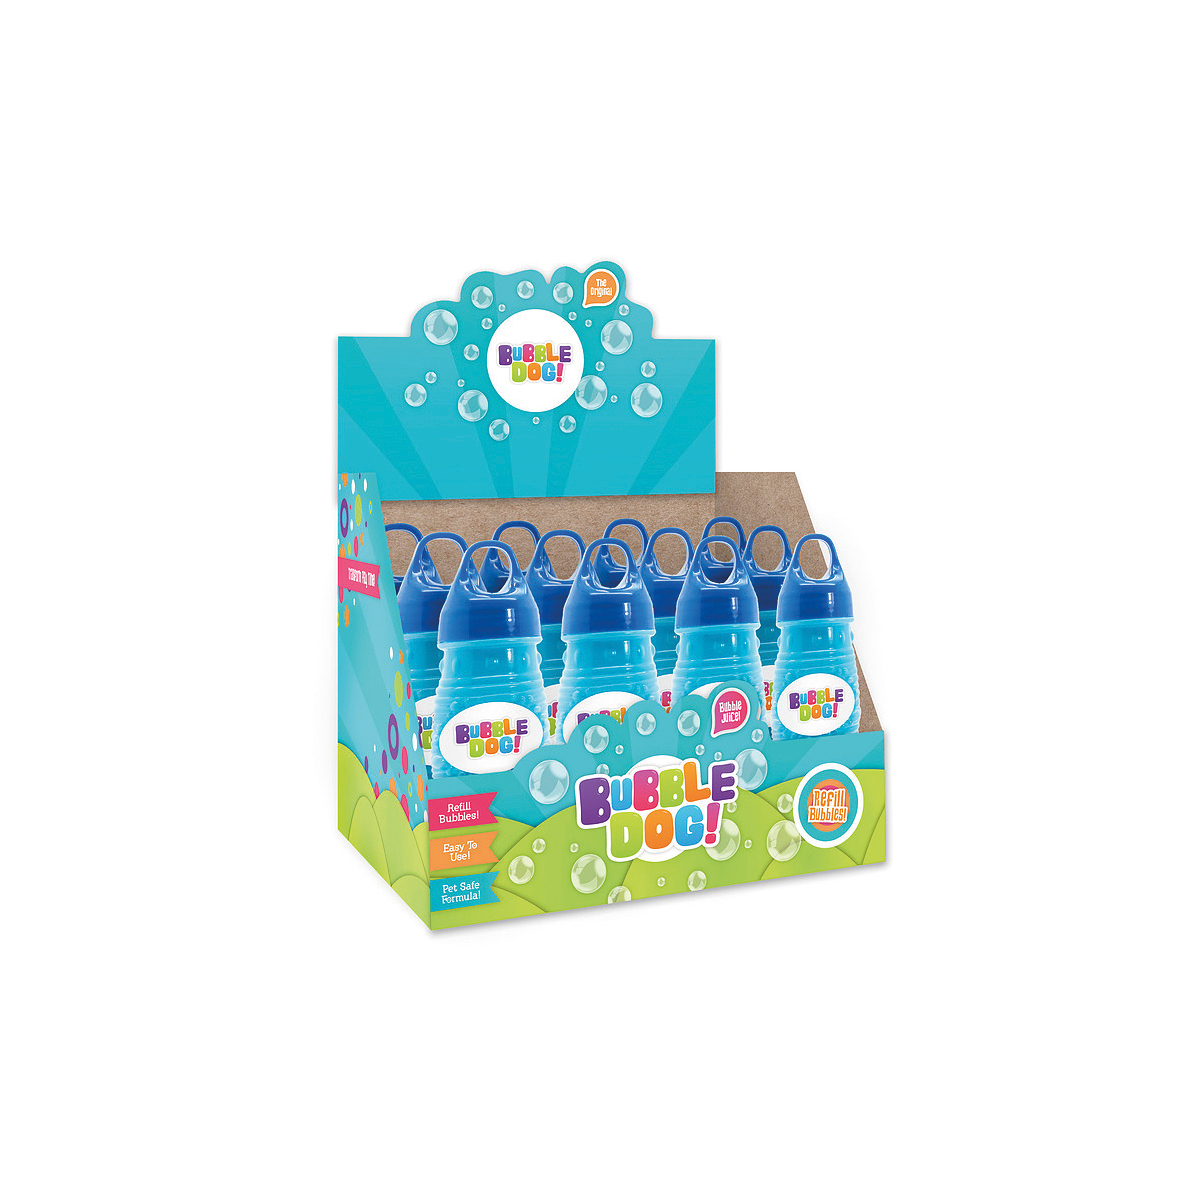 Bubble dog refill solution blauw 10 ml